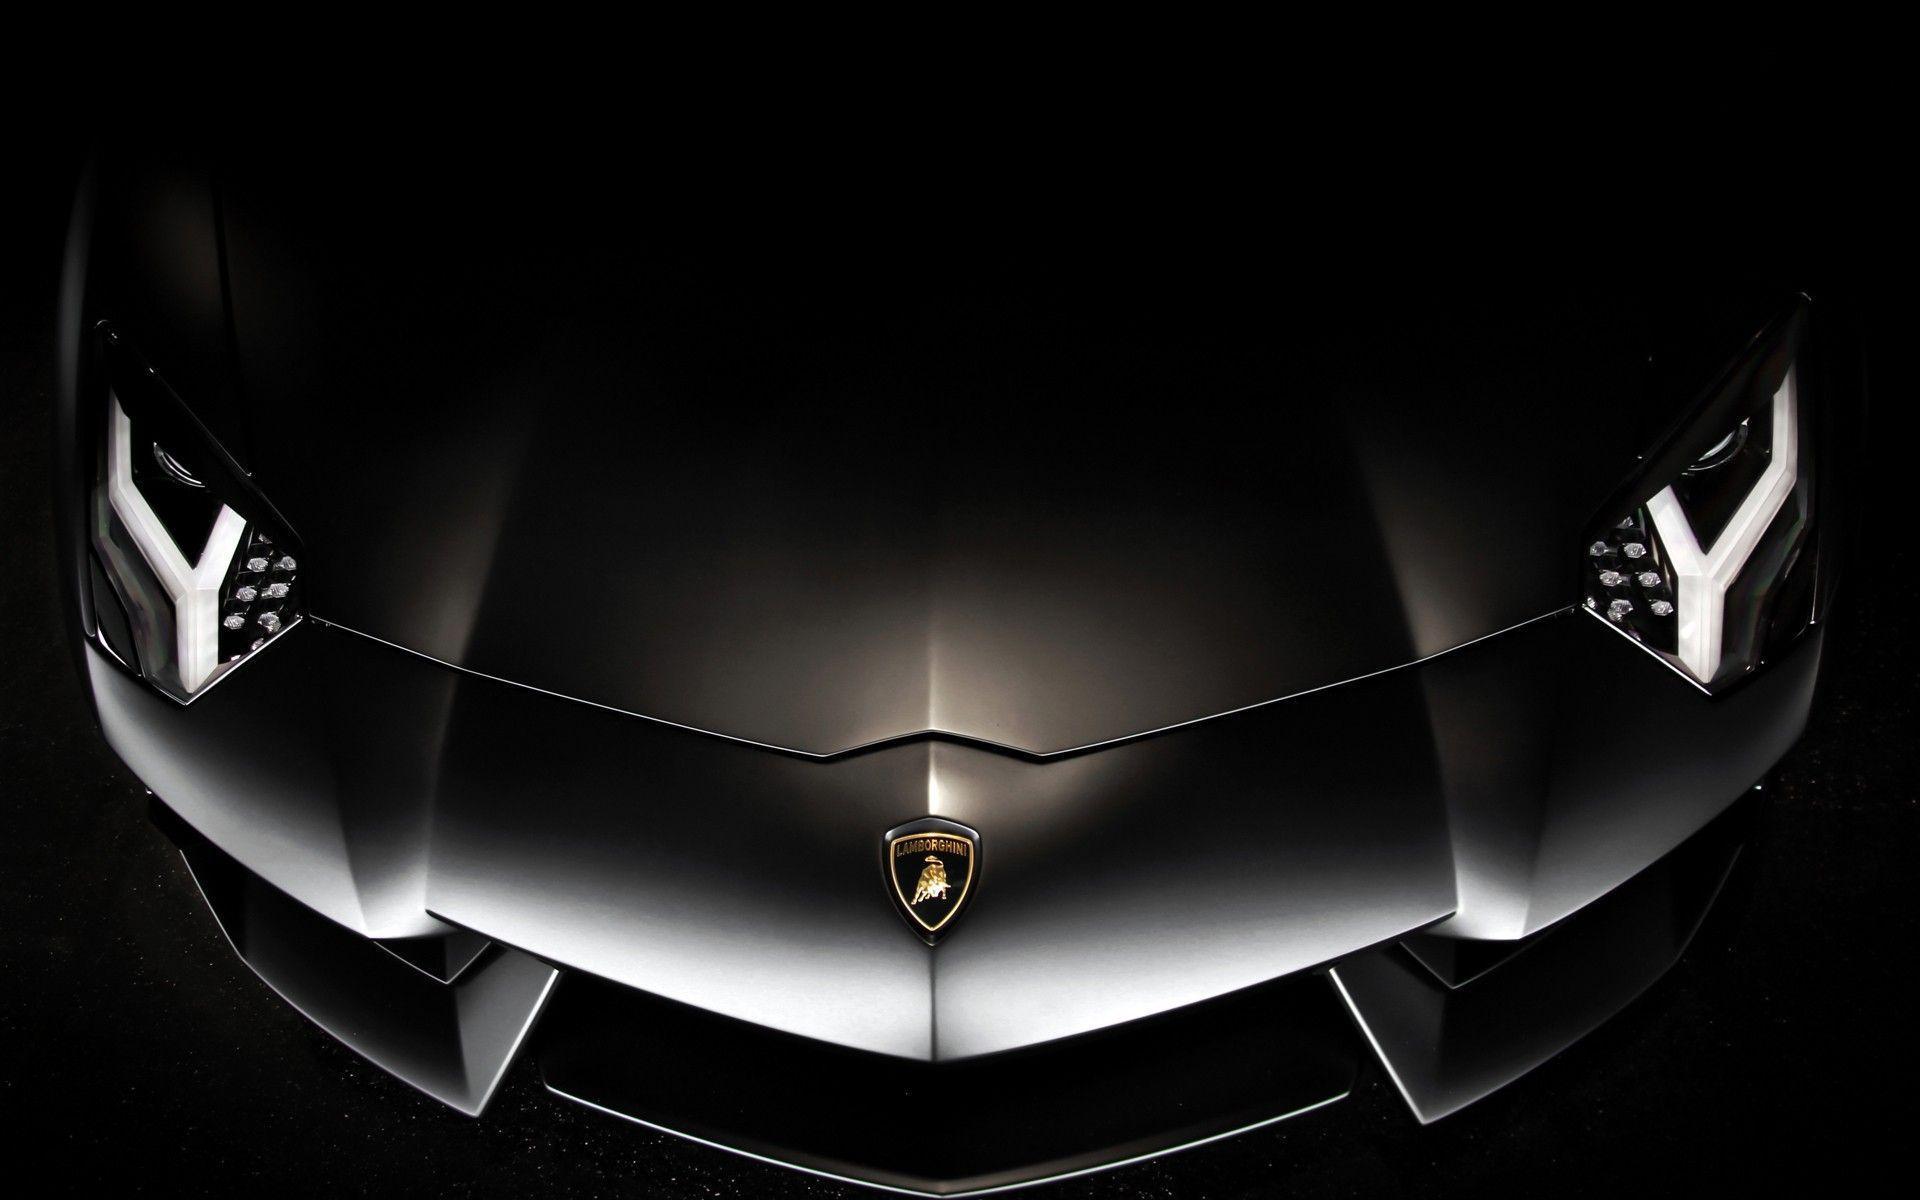 Lamborghini Logo Wallpaper - New Wallpapers